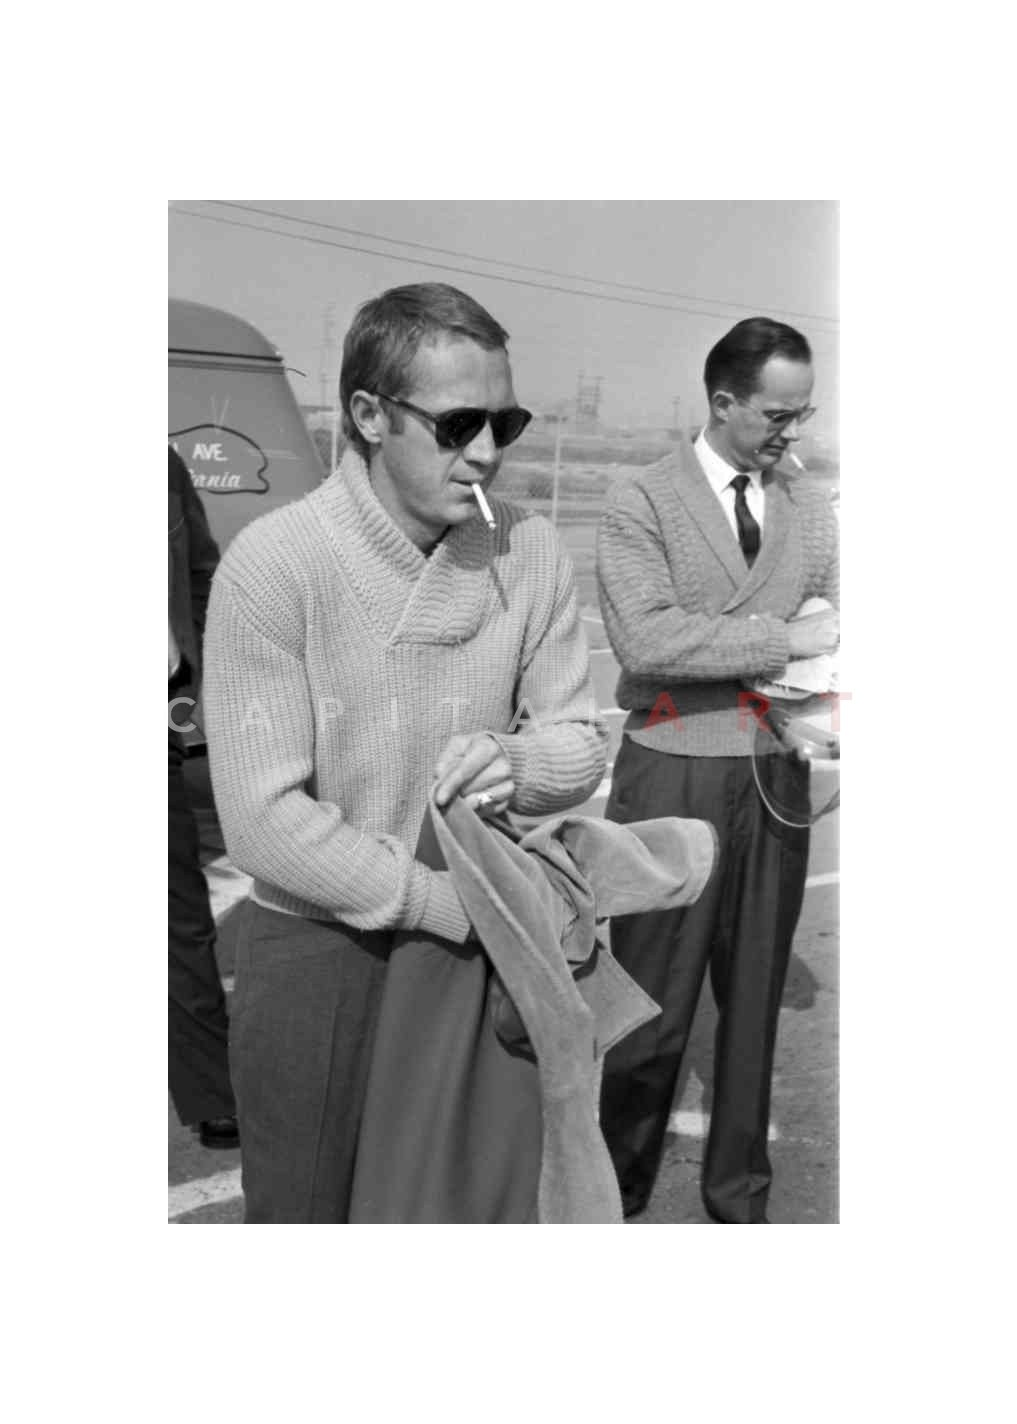 Steve_McQueen_smoking_cigarette_cigar_cigarmonkeys.com